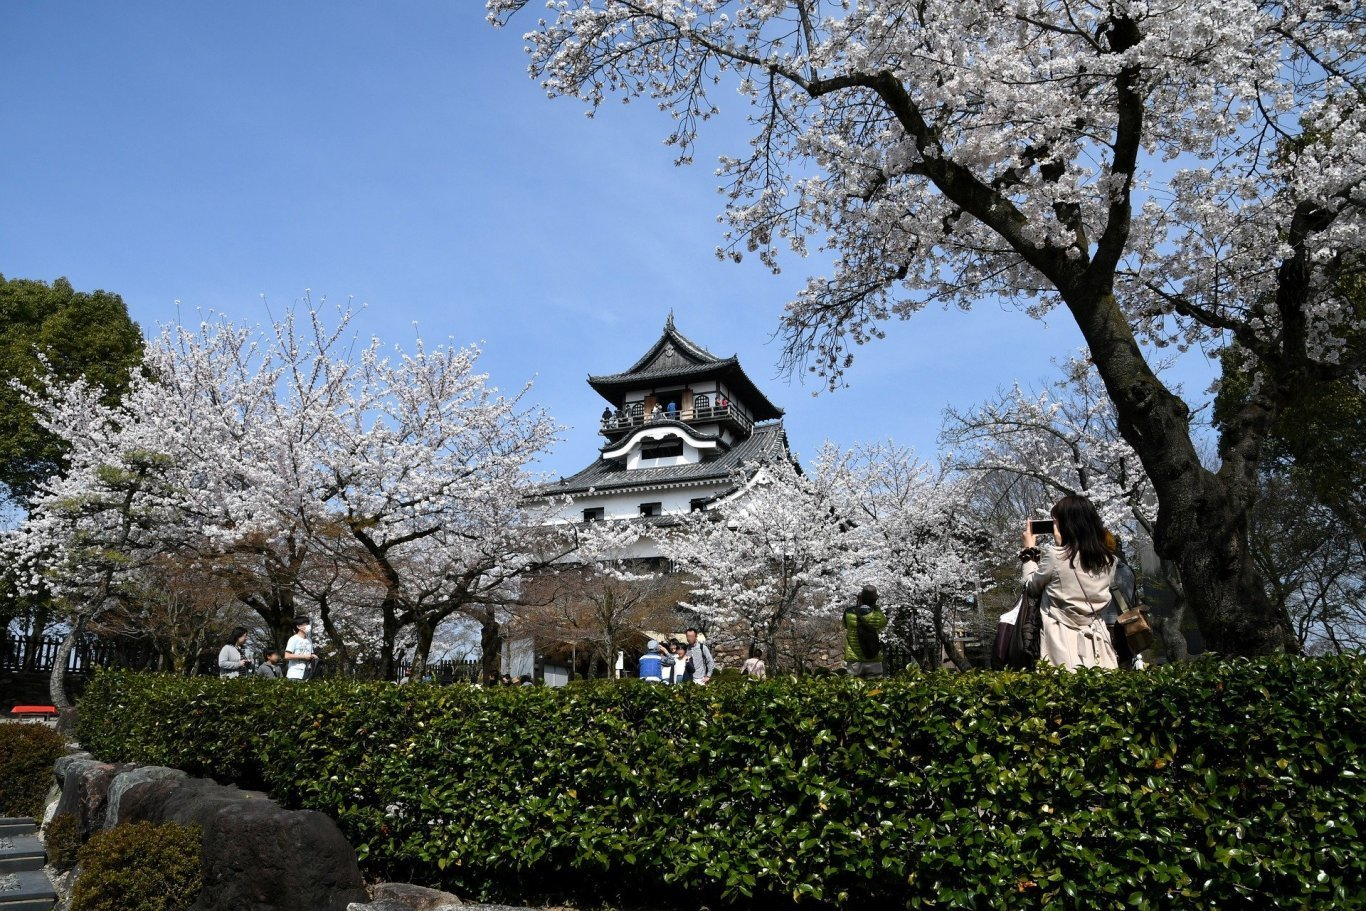 4-Day Samurai Craft in Japan - Japan Itinerary